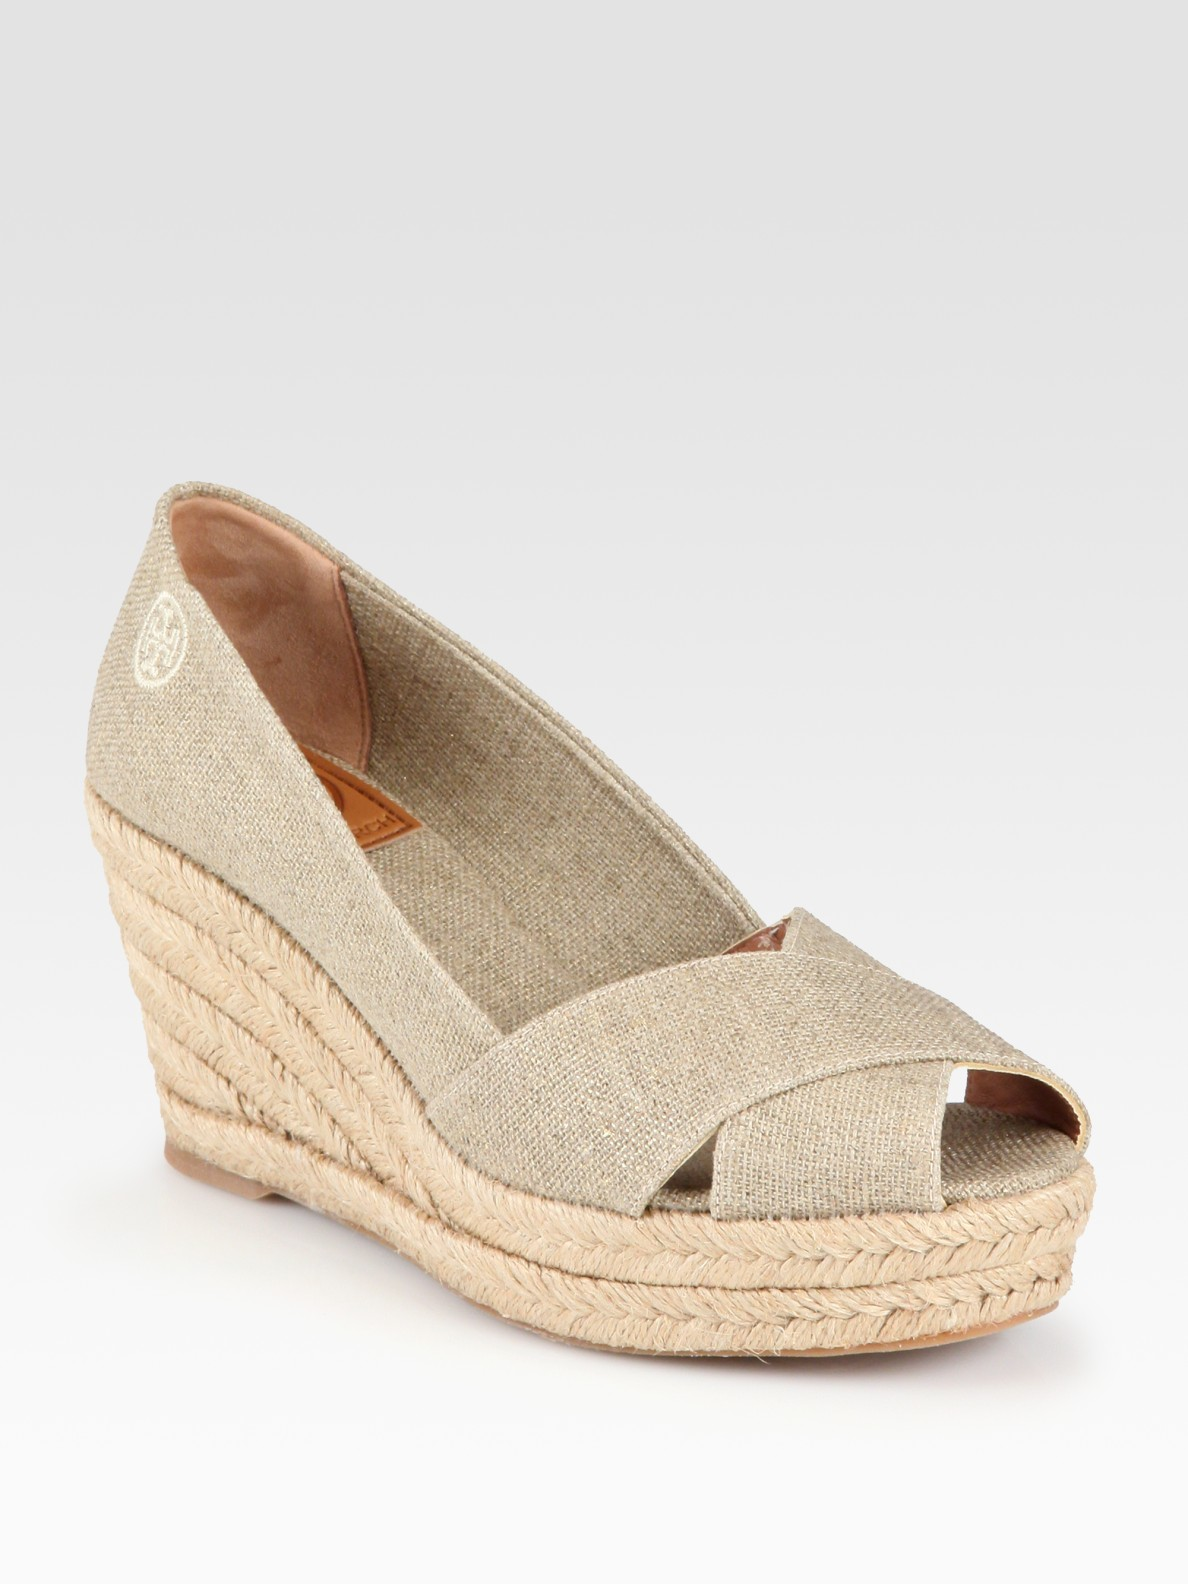 11568fbd10d363 Lyst - Tory Burch Filipa Metallic Linen Espadrille Wedge Sandals in ...